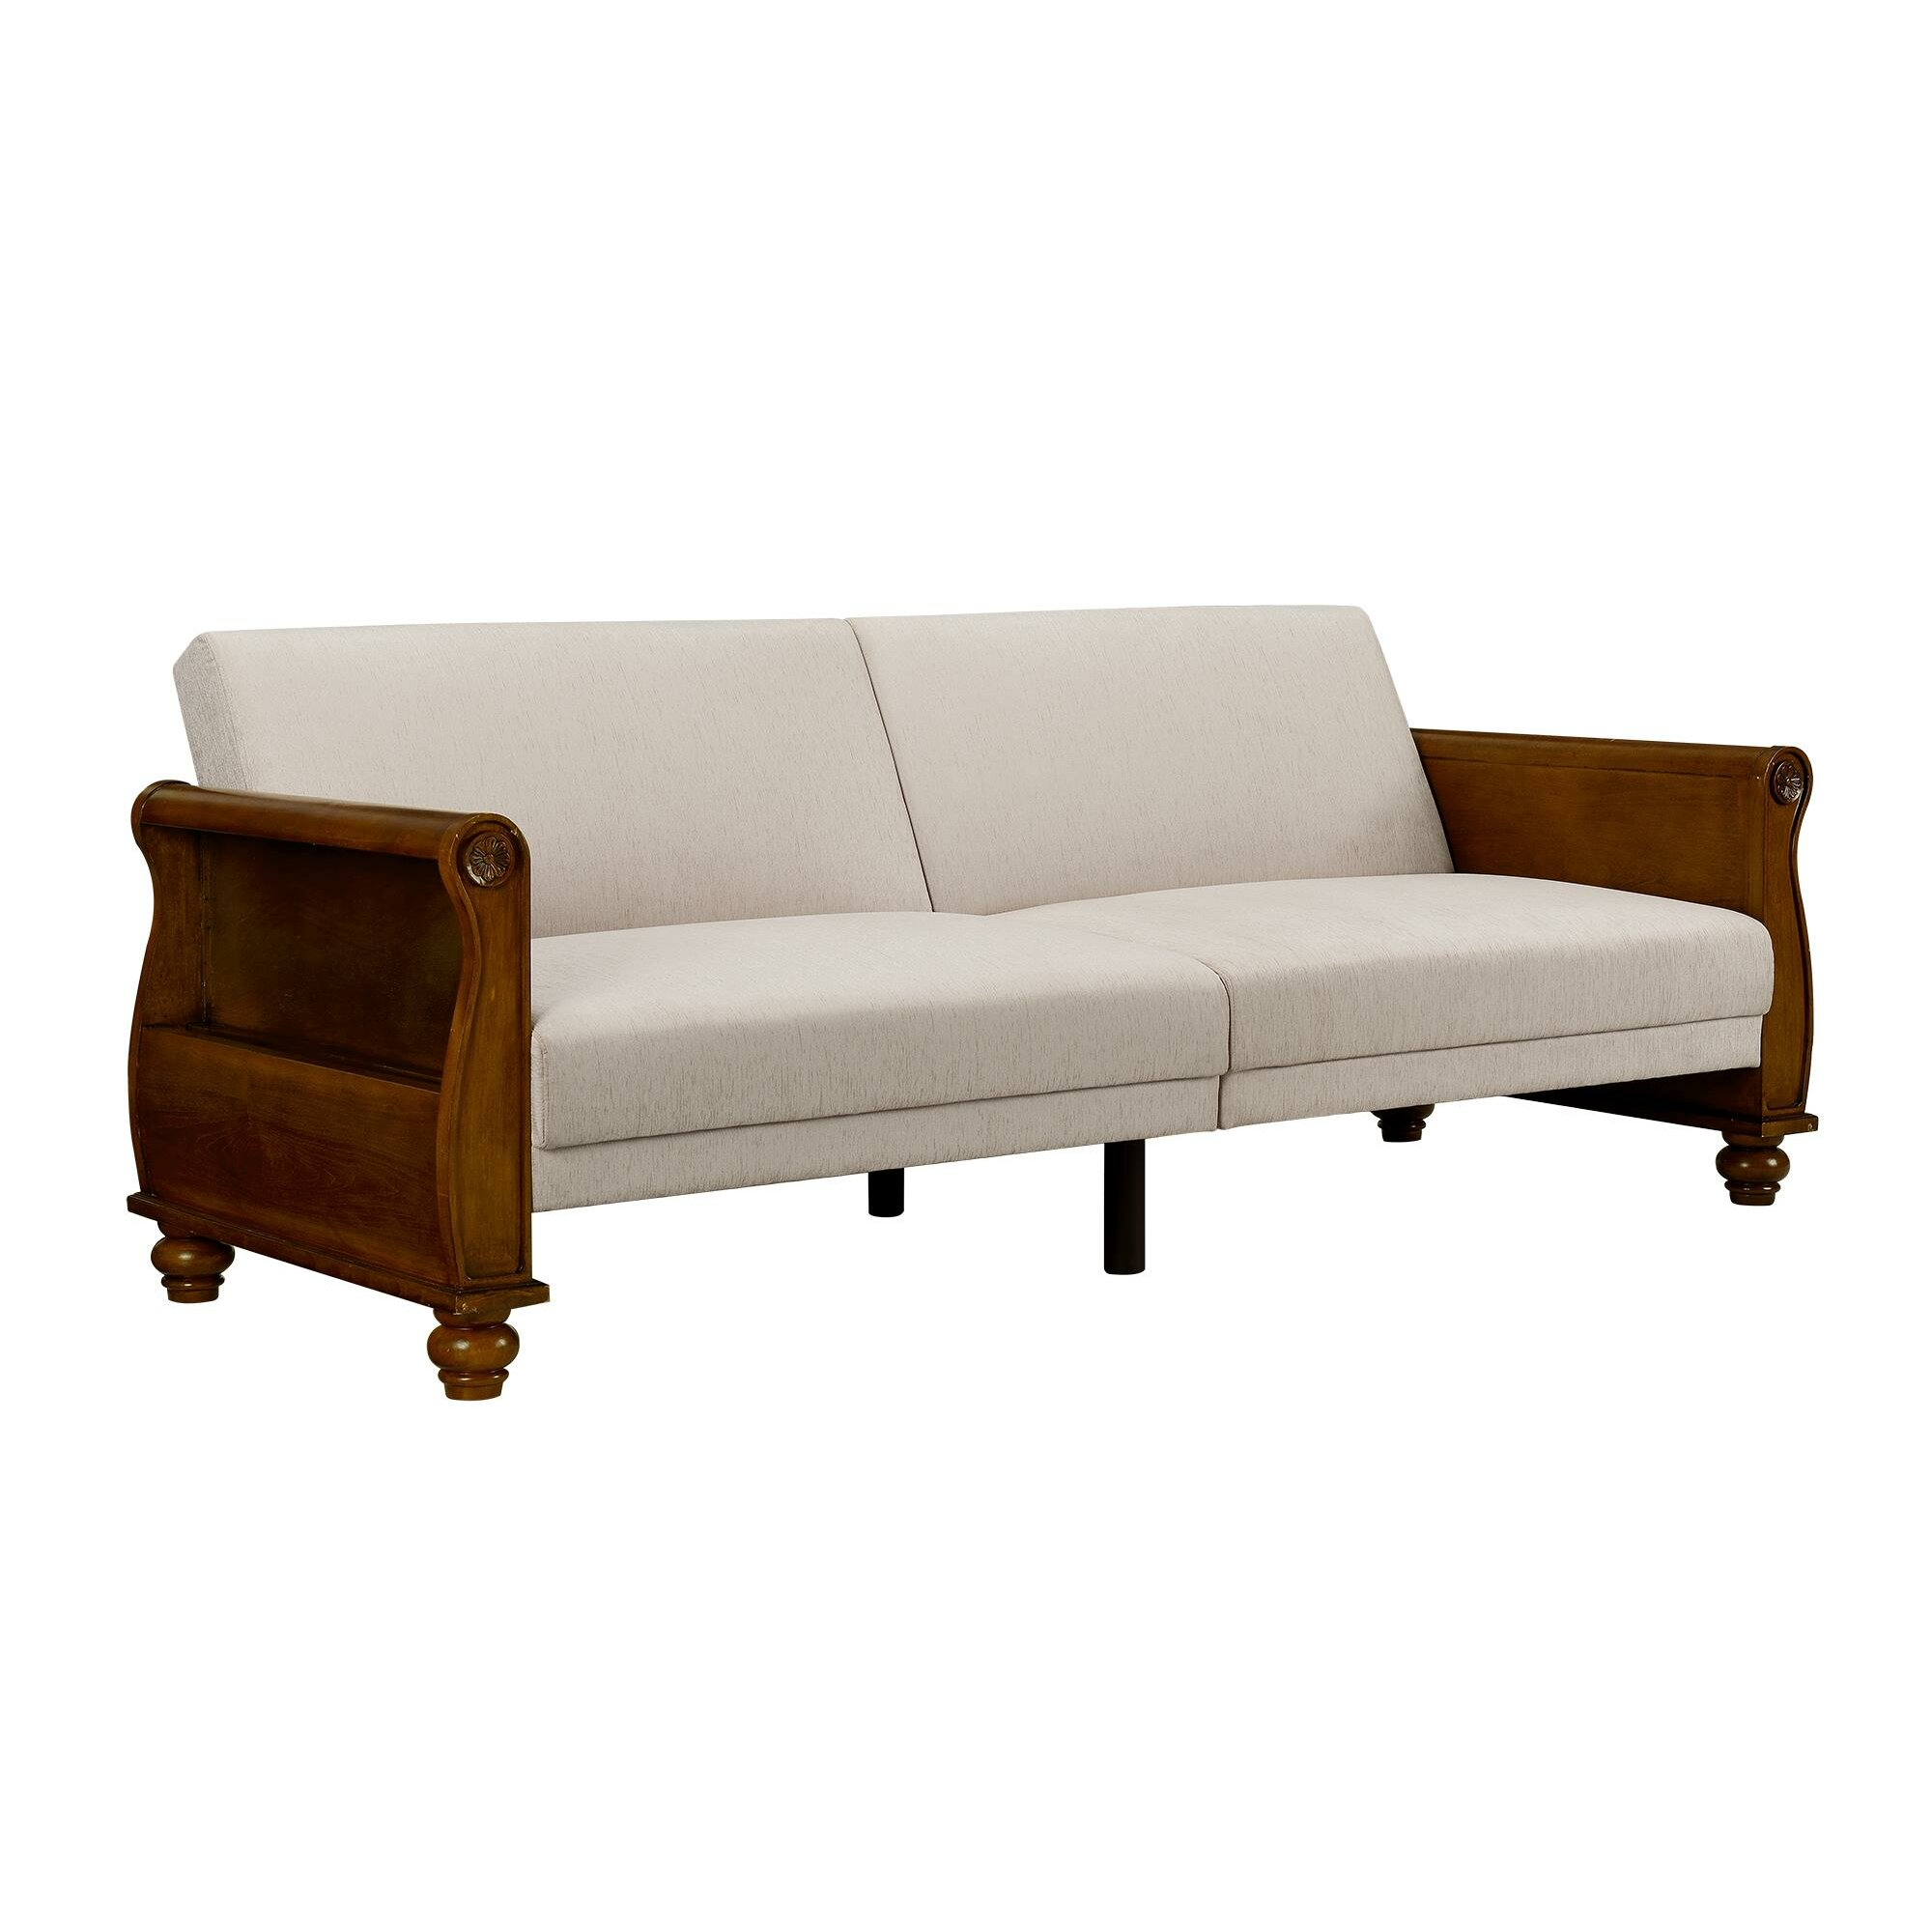 Dhp Frisco Sleeper Sofa Amp Reviews Wayfair Ca